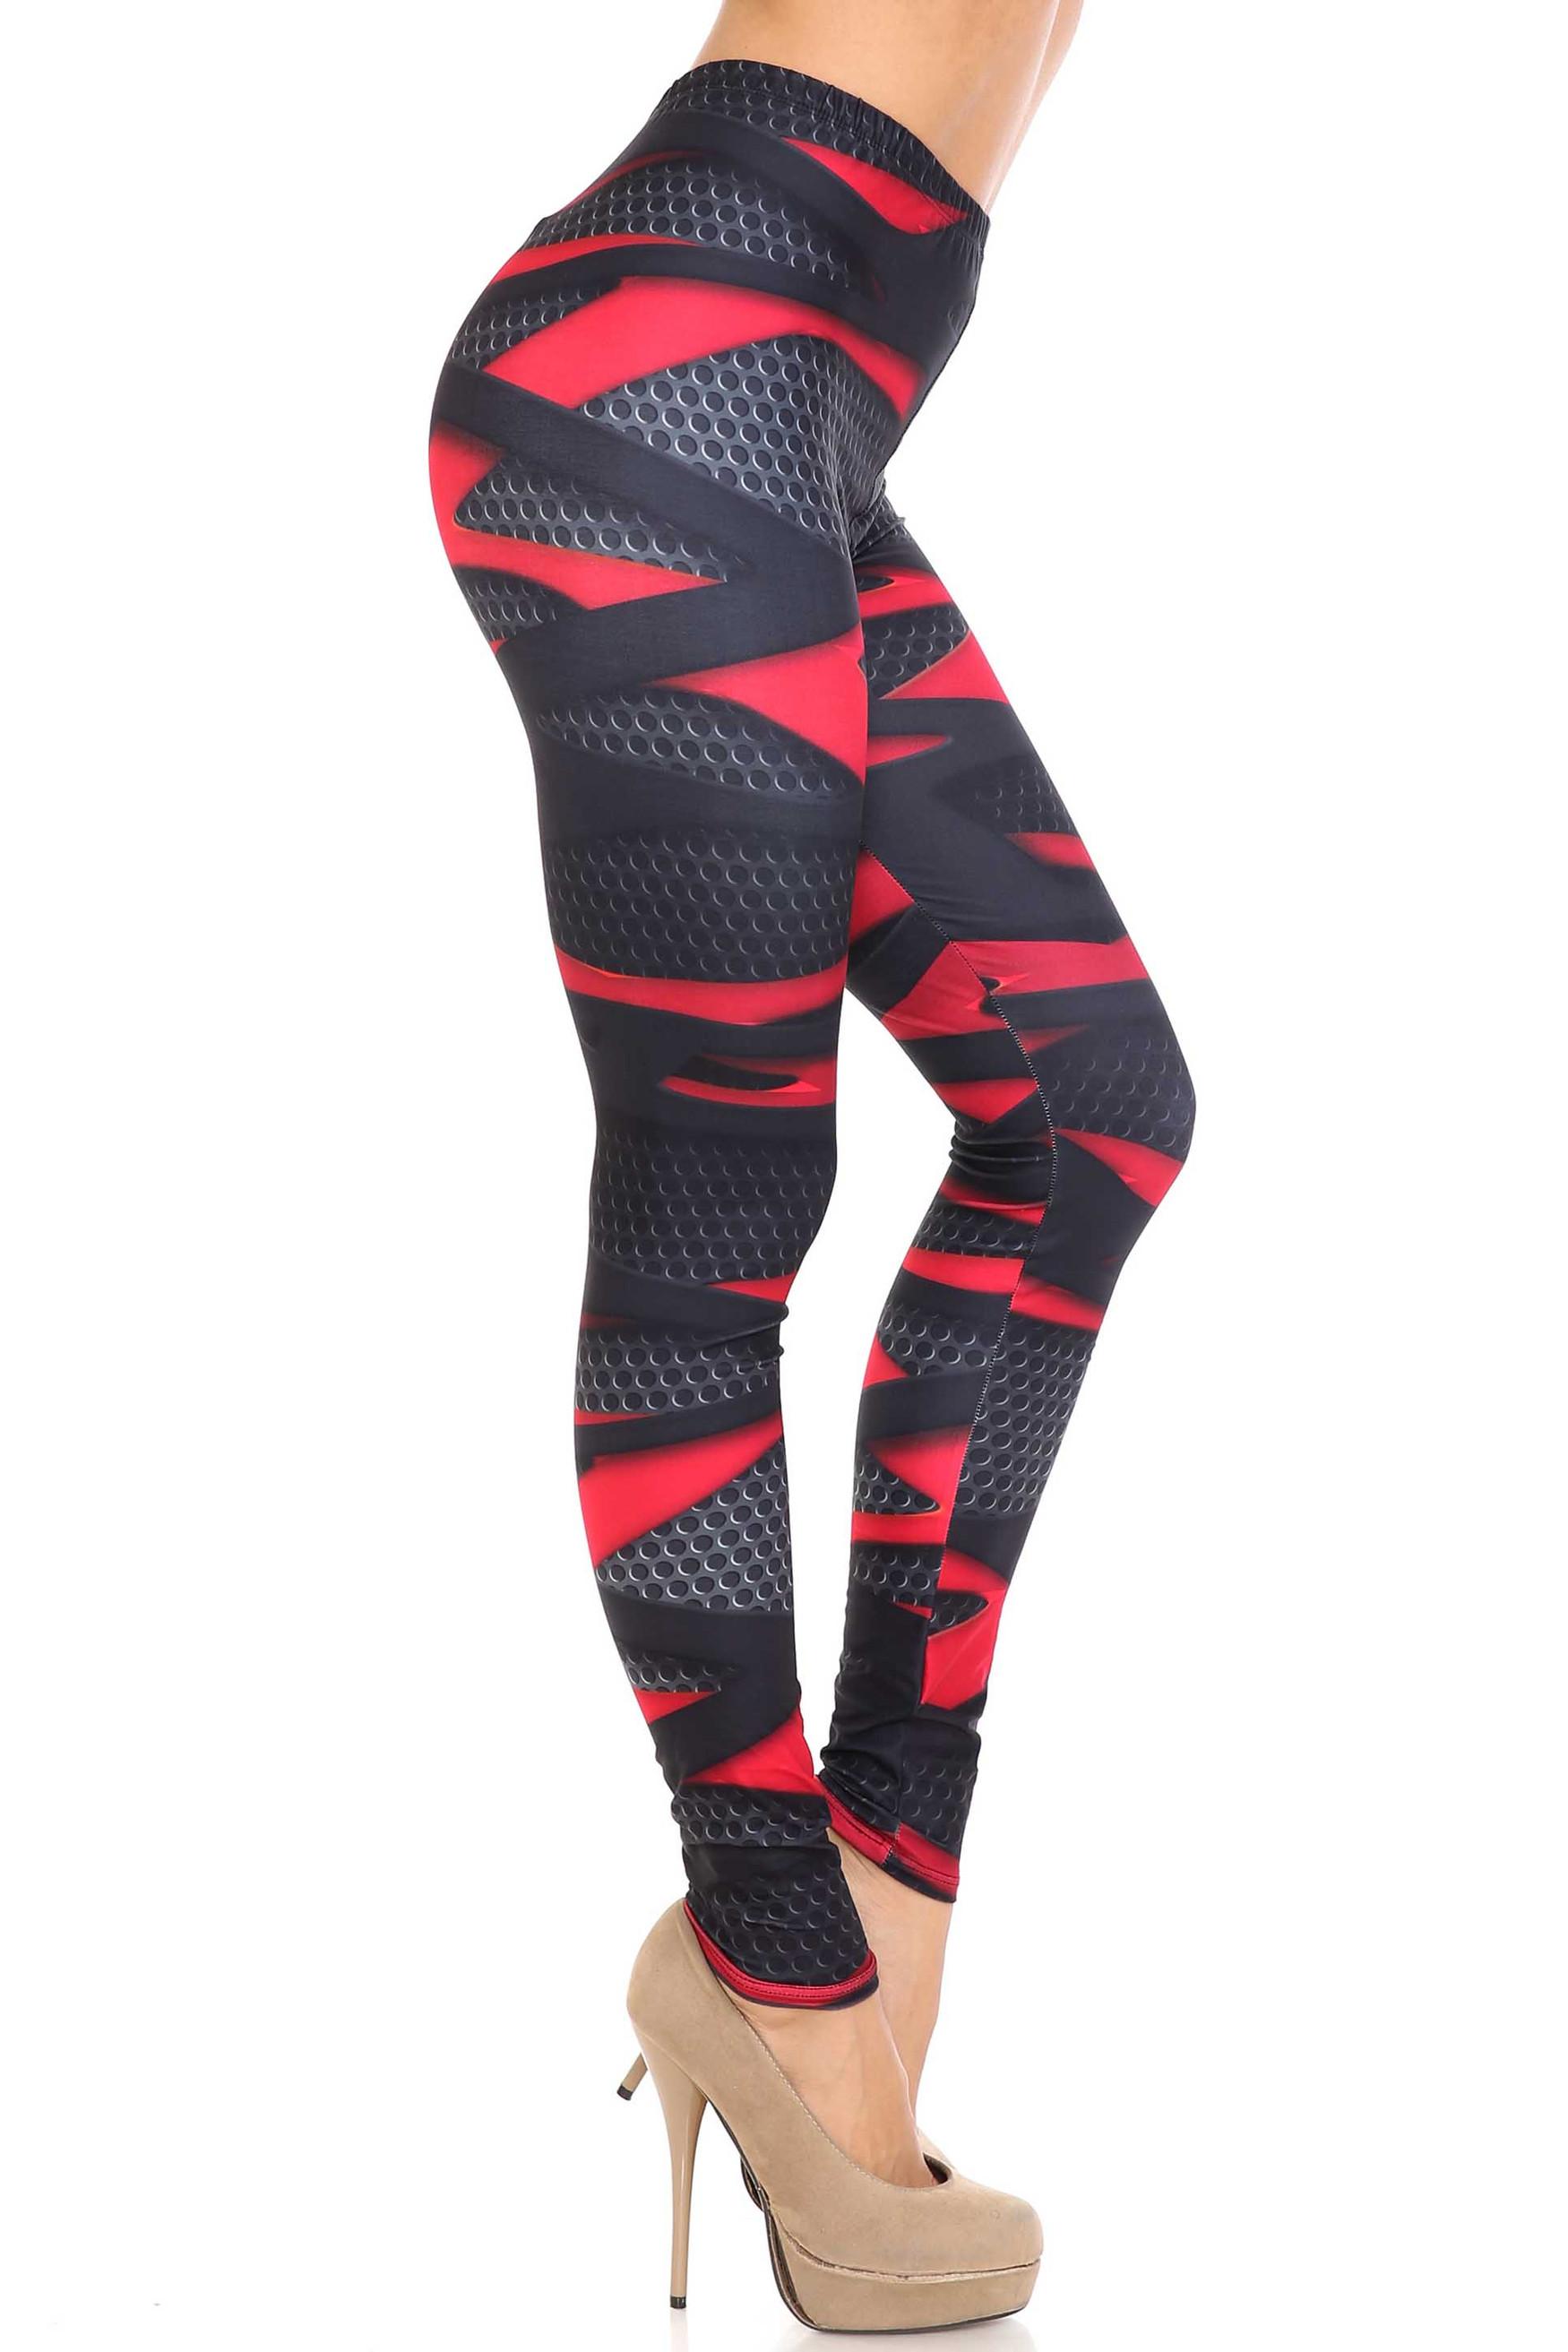 Creamy Soft Cascading 3D Sport Wrap Leggings - USA Fashion™